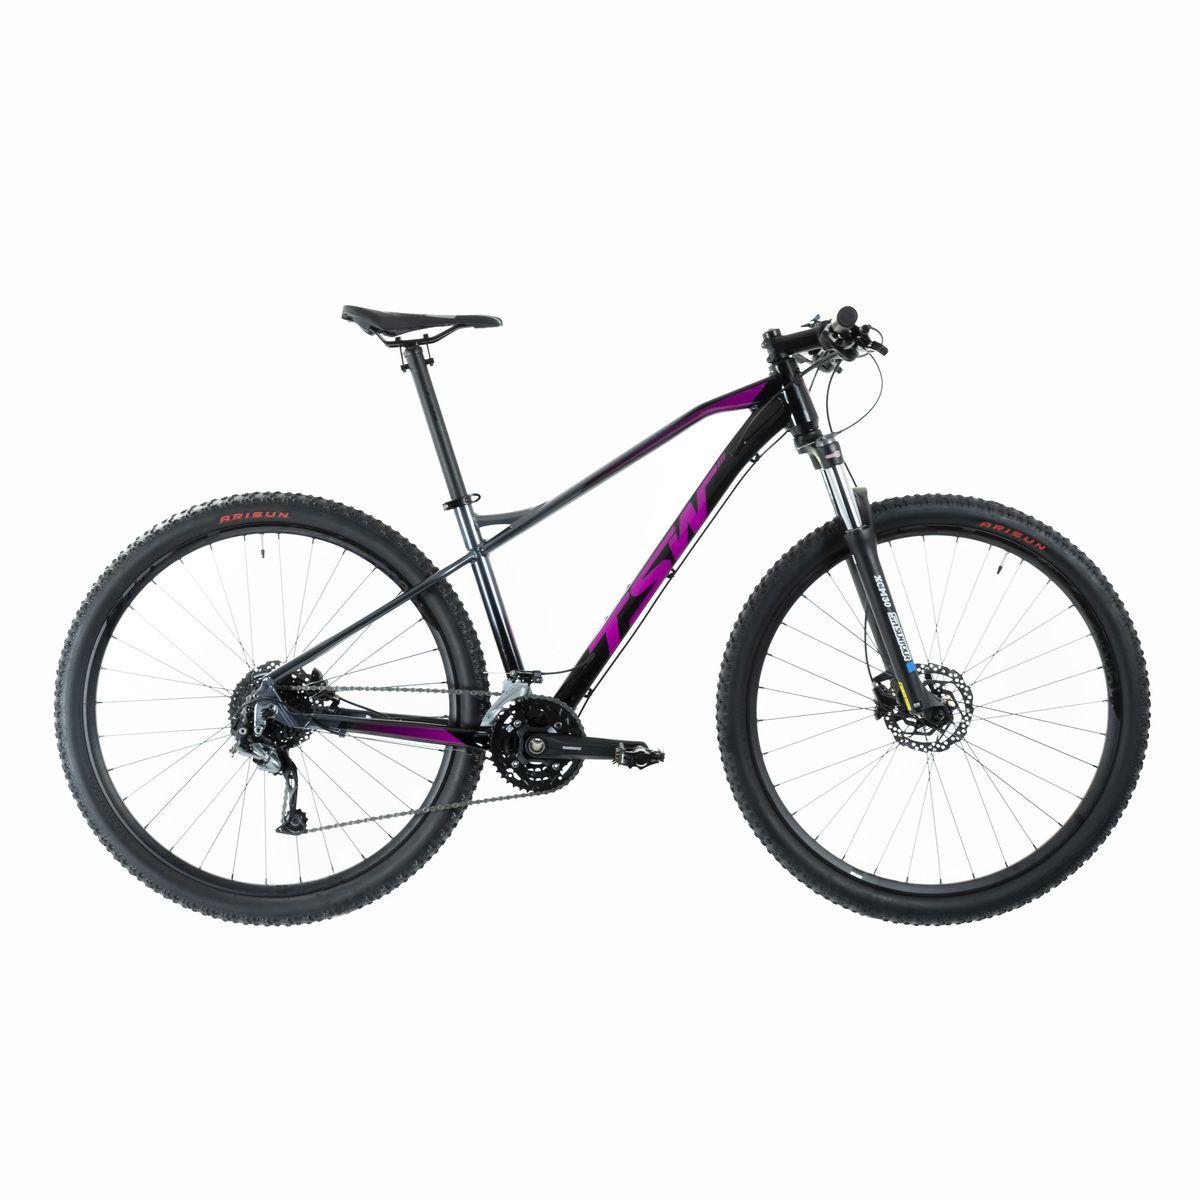 Bicicleta aro 29 Tsw Stamina 2019 27V shimano Alivio